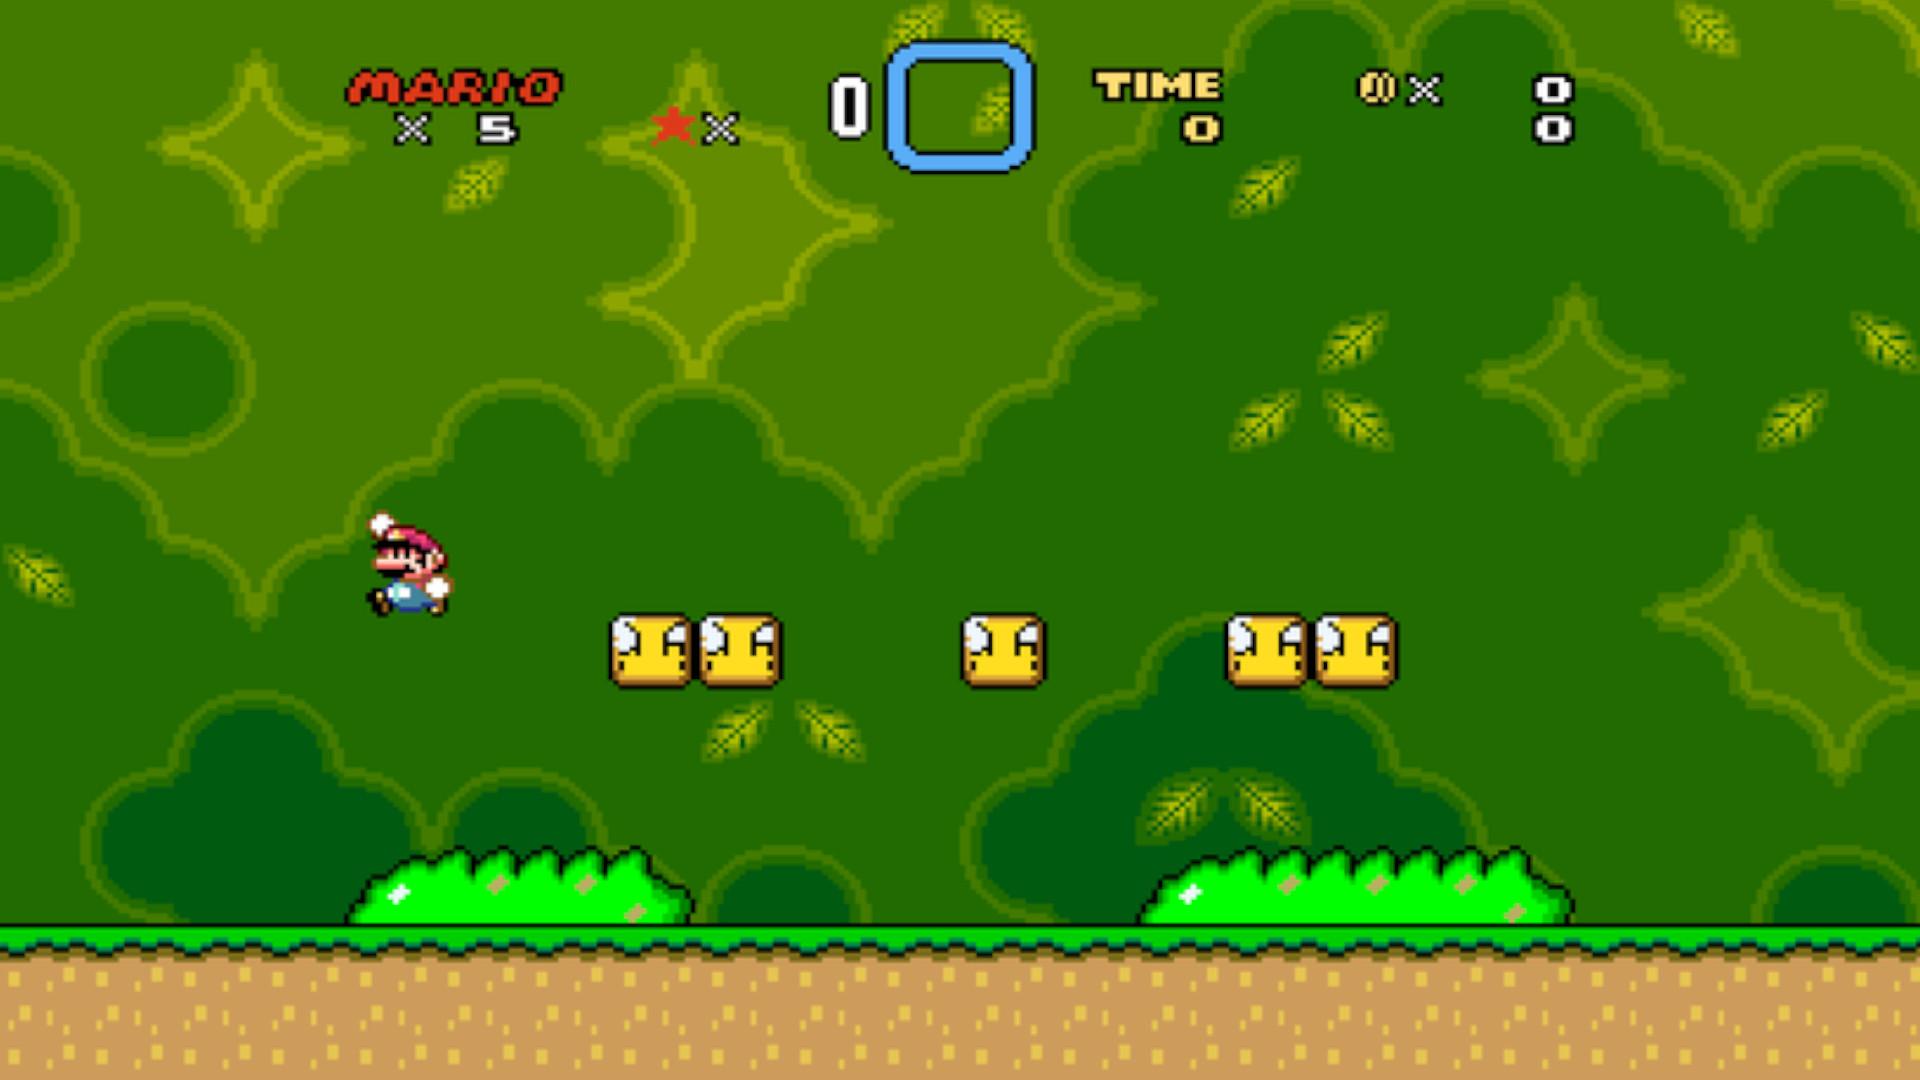 Super Mario World Widescreen launches next week